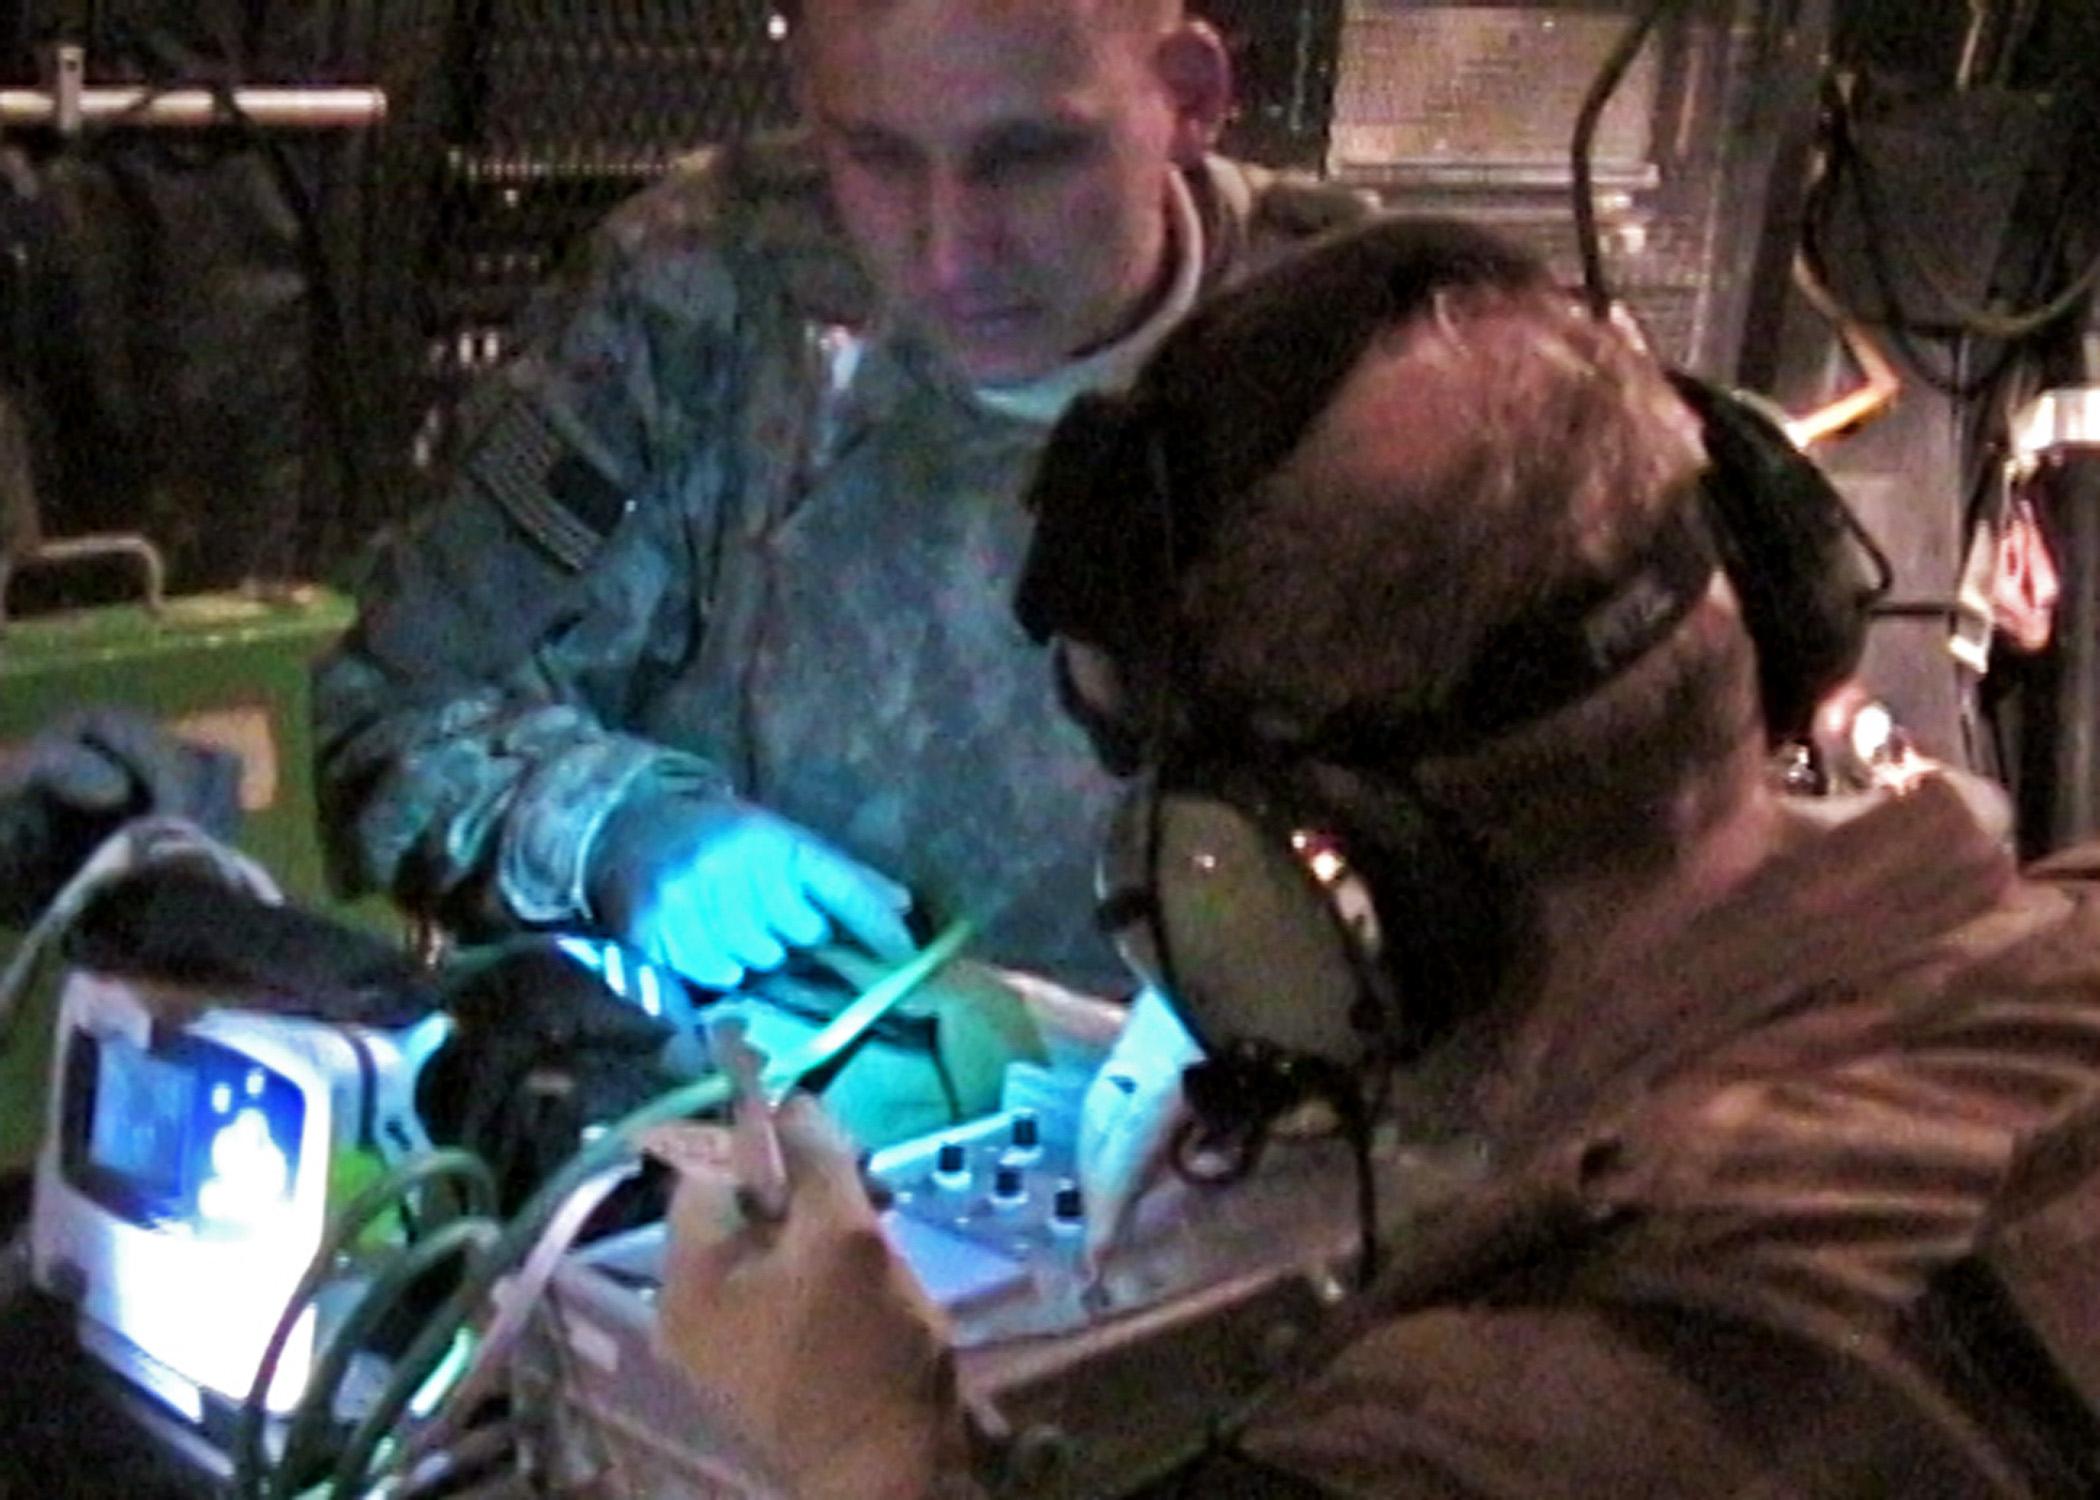 Afghan Dan duke crew recognized for life-saving afghan mission > 919th